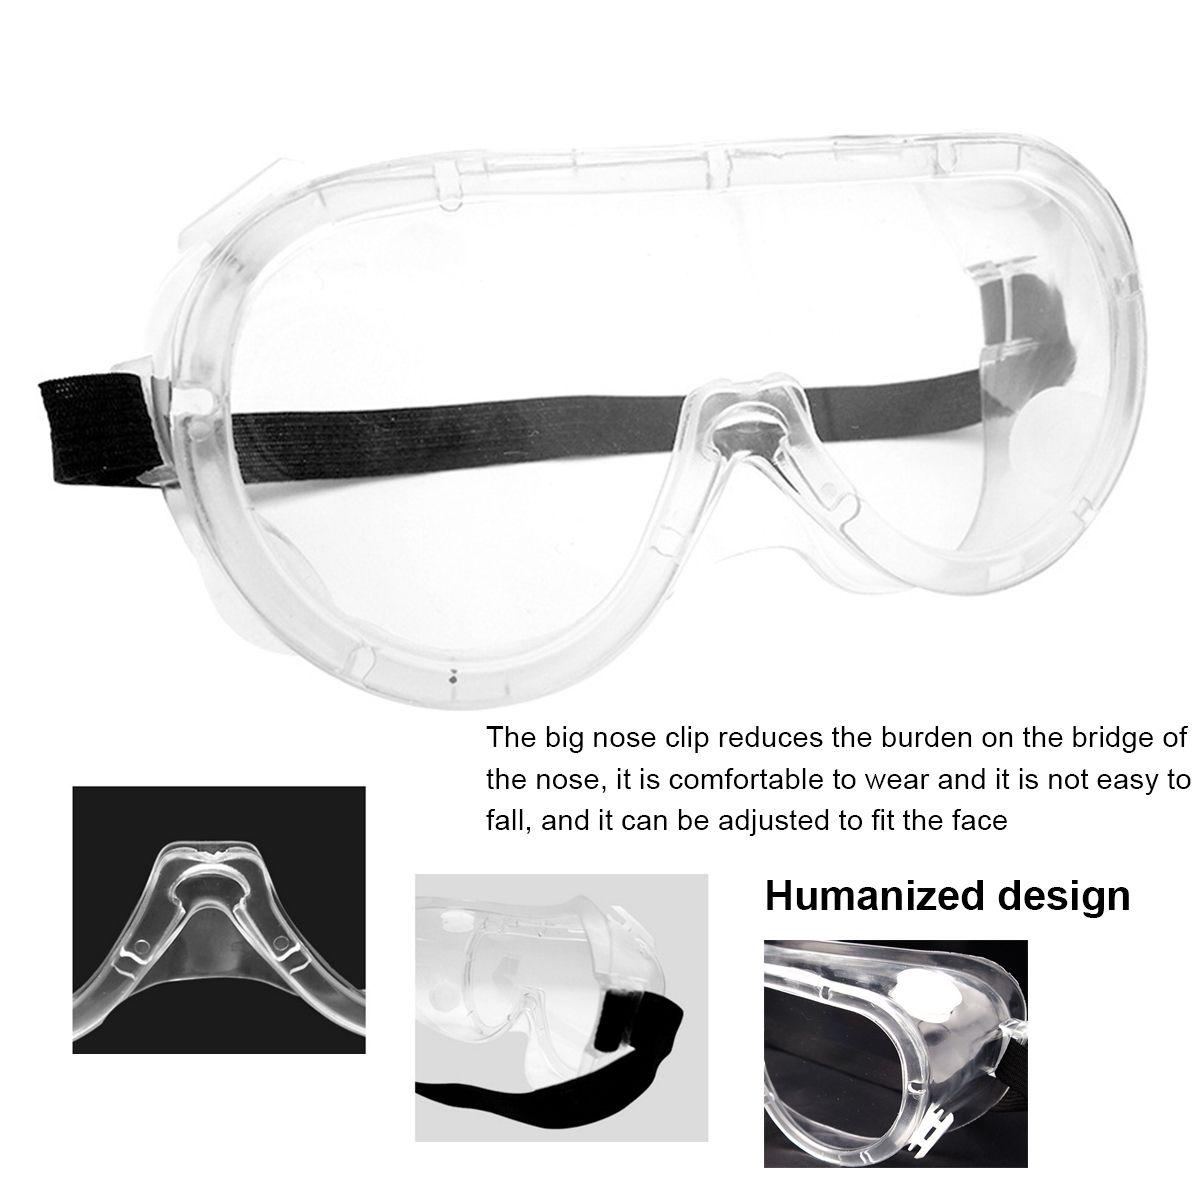 Medical Safety Protective Goggles Medical Glasses Transparent Lens Goggles Prevent Infection Eye Mask Anti-Fog Splash Goggles